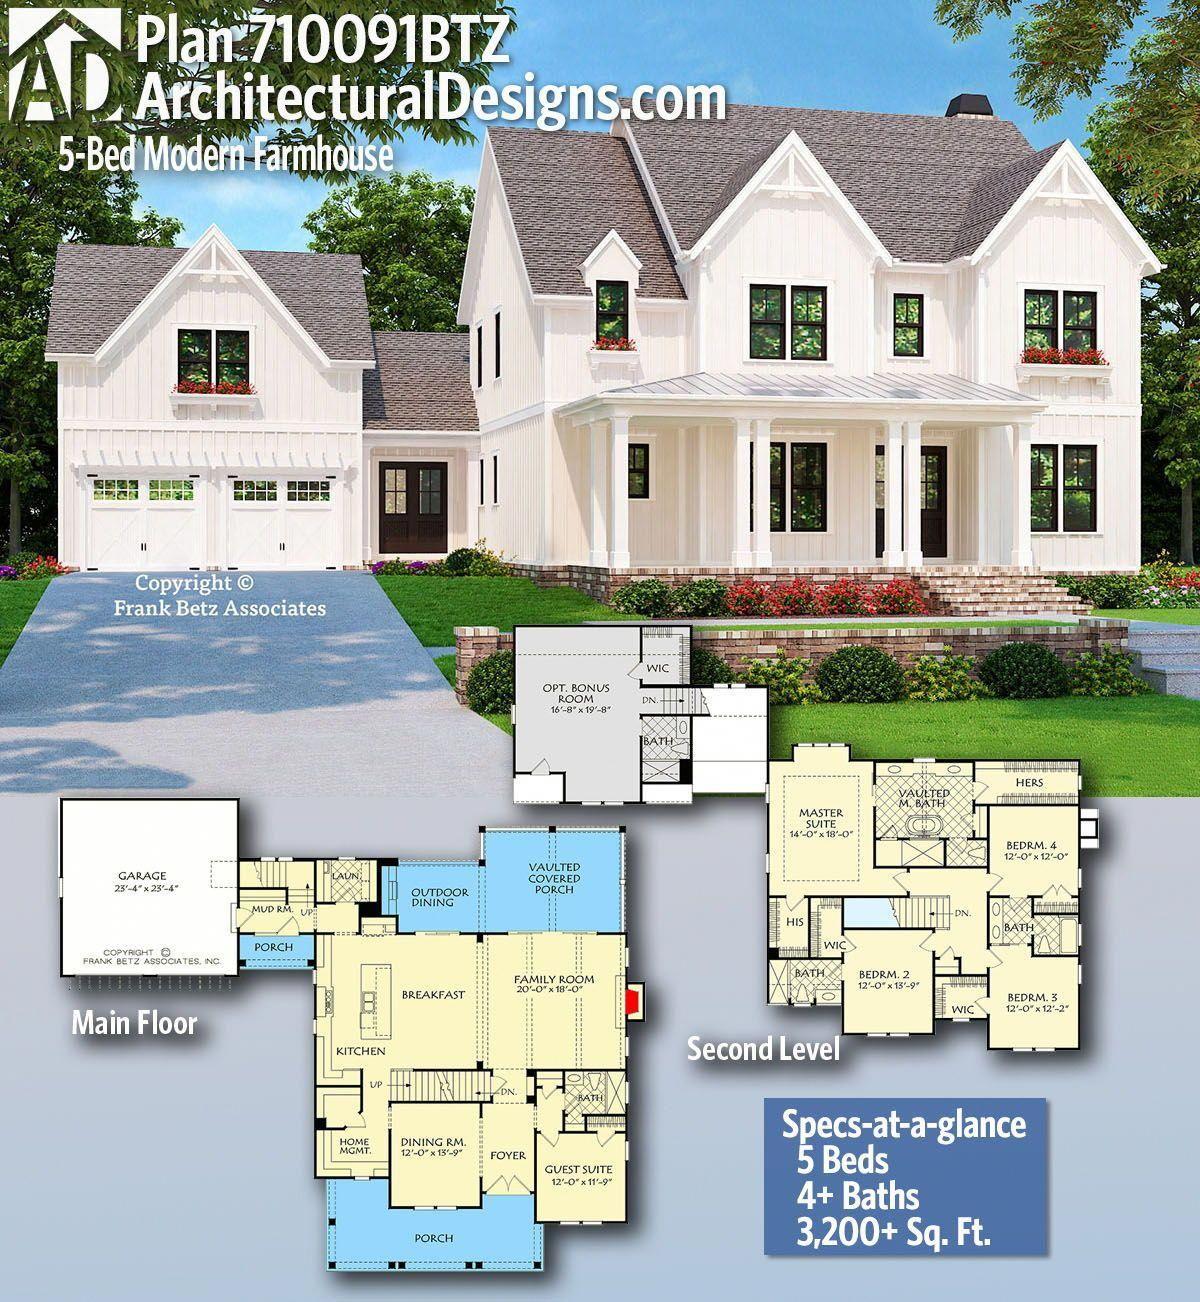 American Dream Homes Mansionsinterior House Plans Farmhouse Plans Dream House Plans